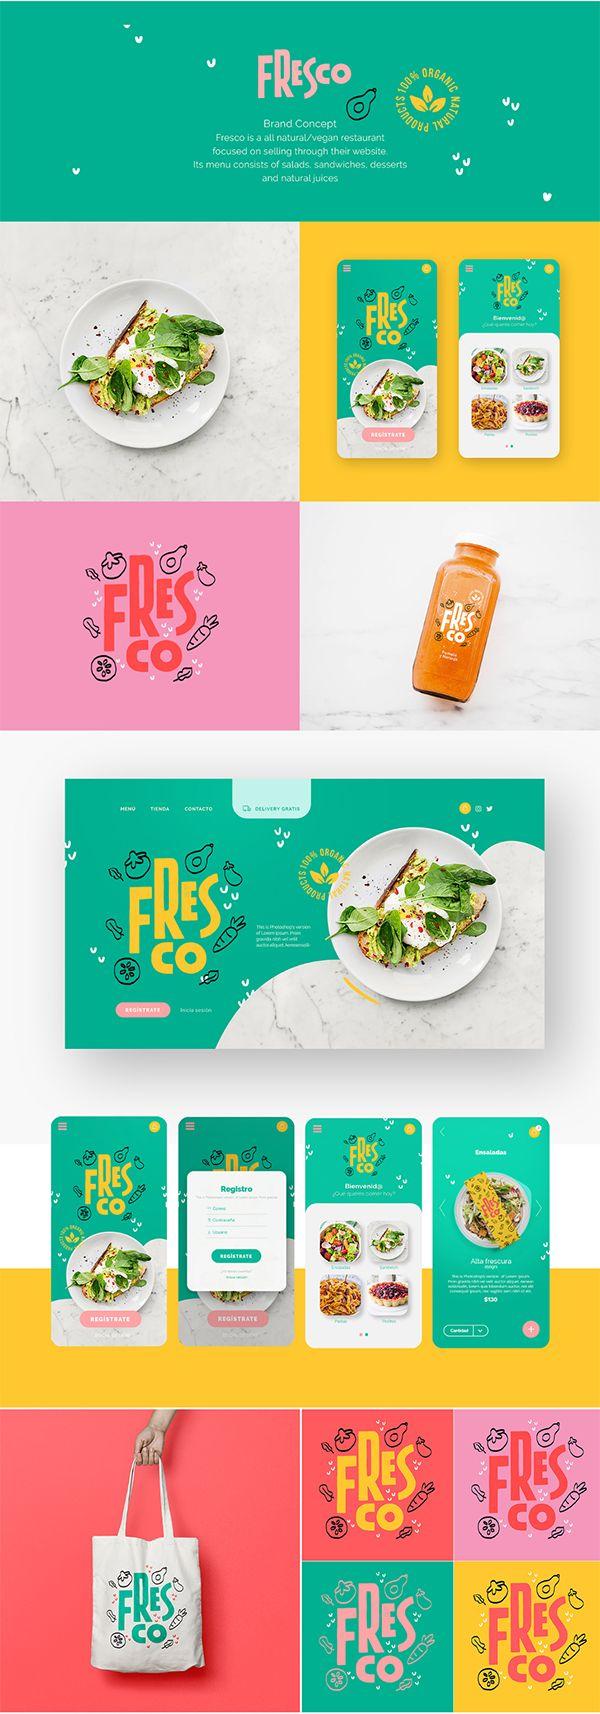 Fresco brand identity design